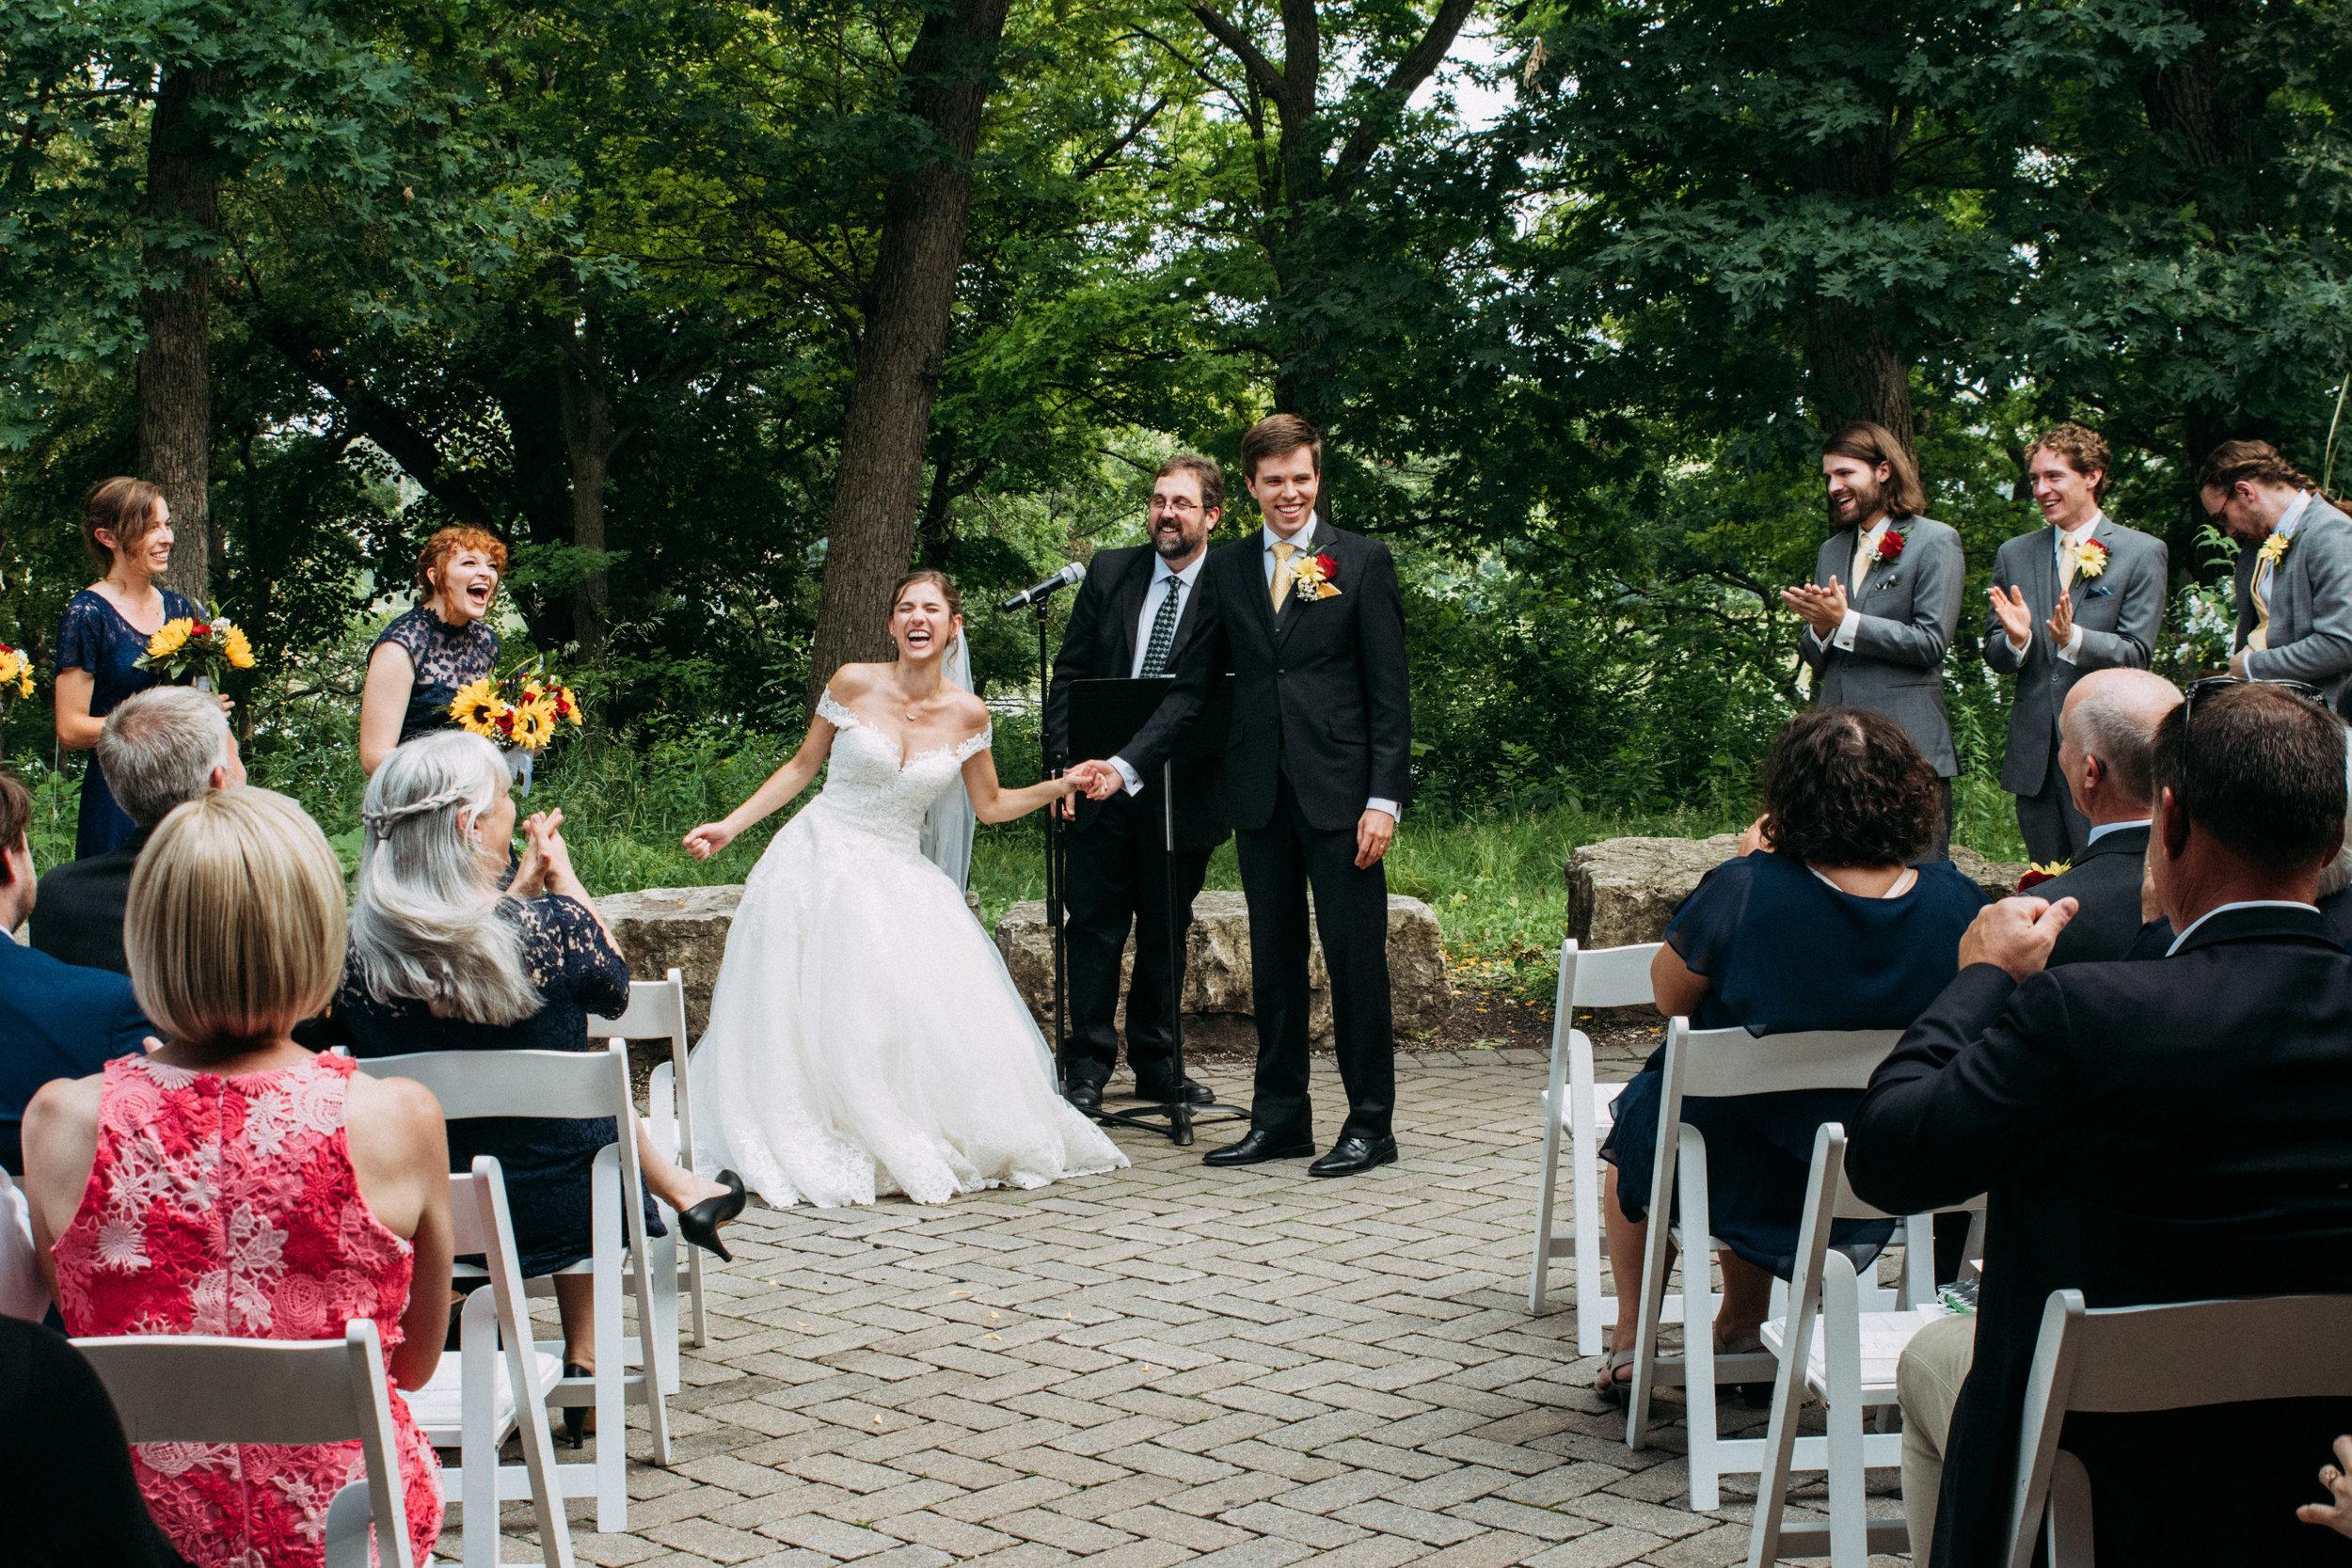 28-Liza_Chris_Minneapolis_Minnesota_Wedding.jpg